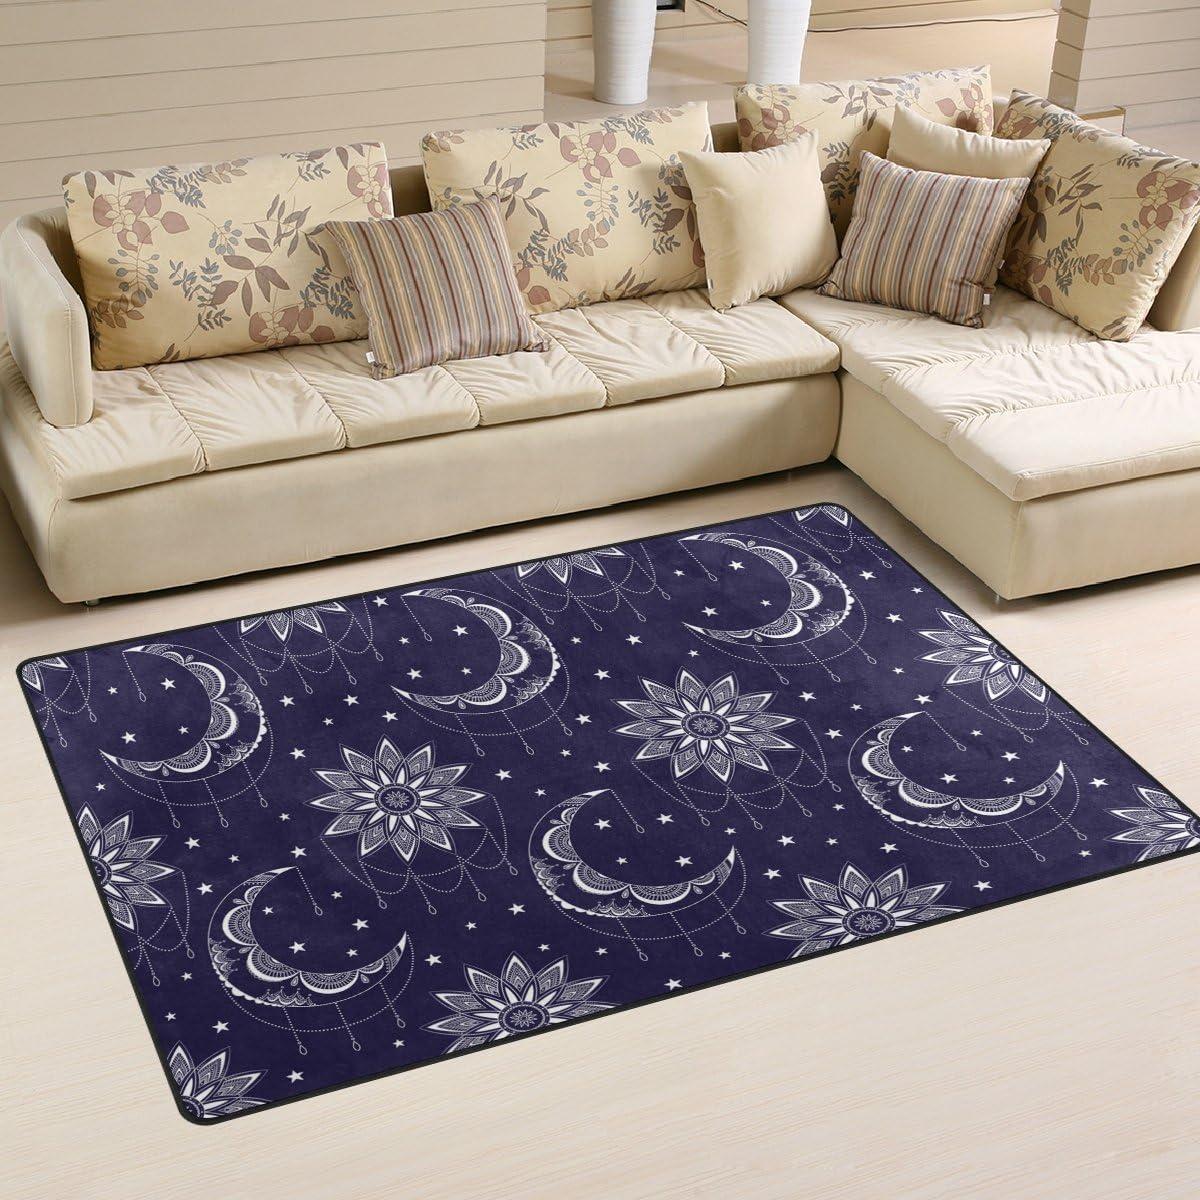 Yochoice Non-slip Area Rugs Home Decor, Vintage Boho Chic Moon Sun and Stars Floor Mat Living Room Bedroom Carpets Doormats 60 x 39 inches